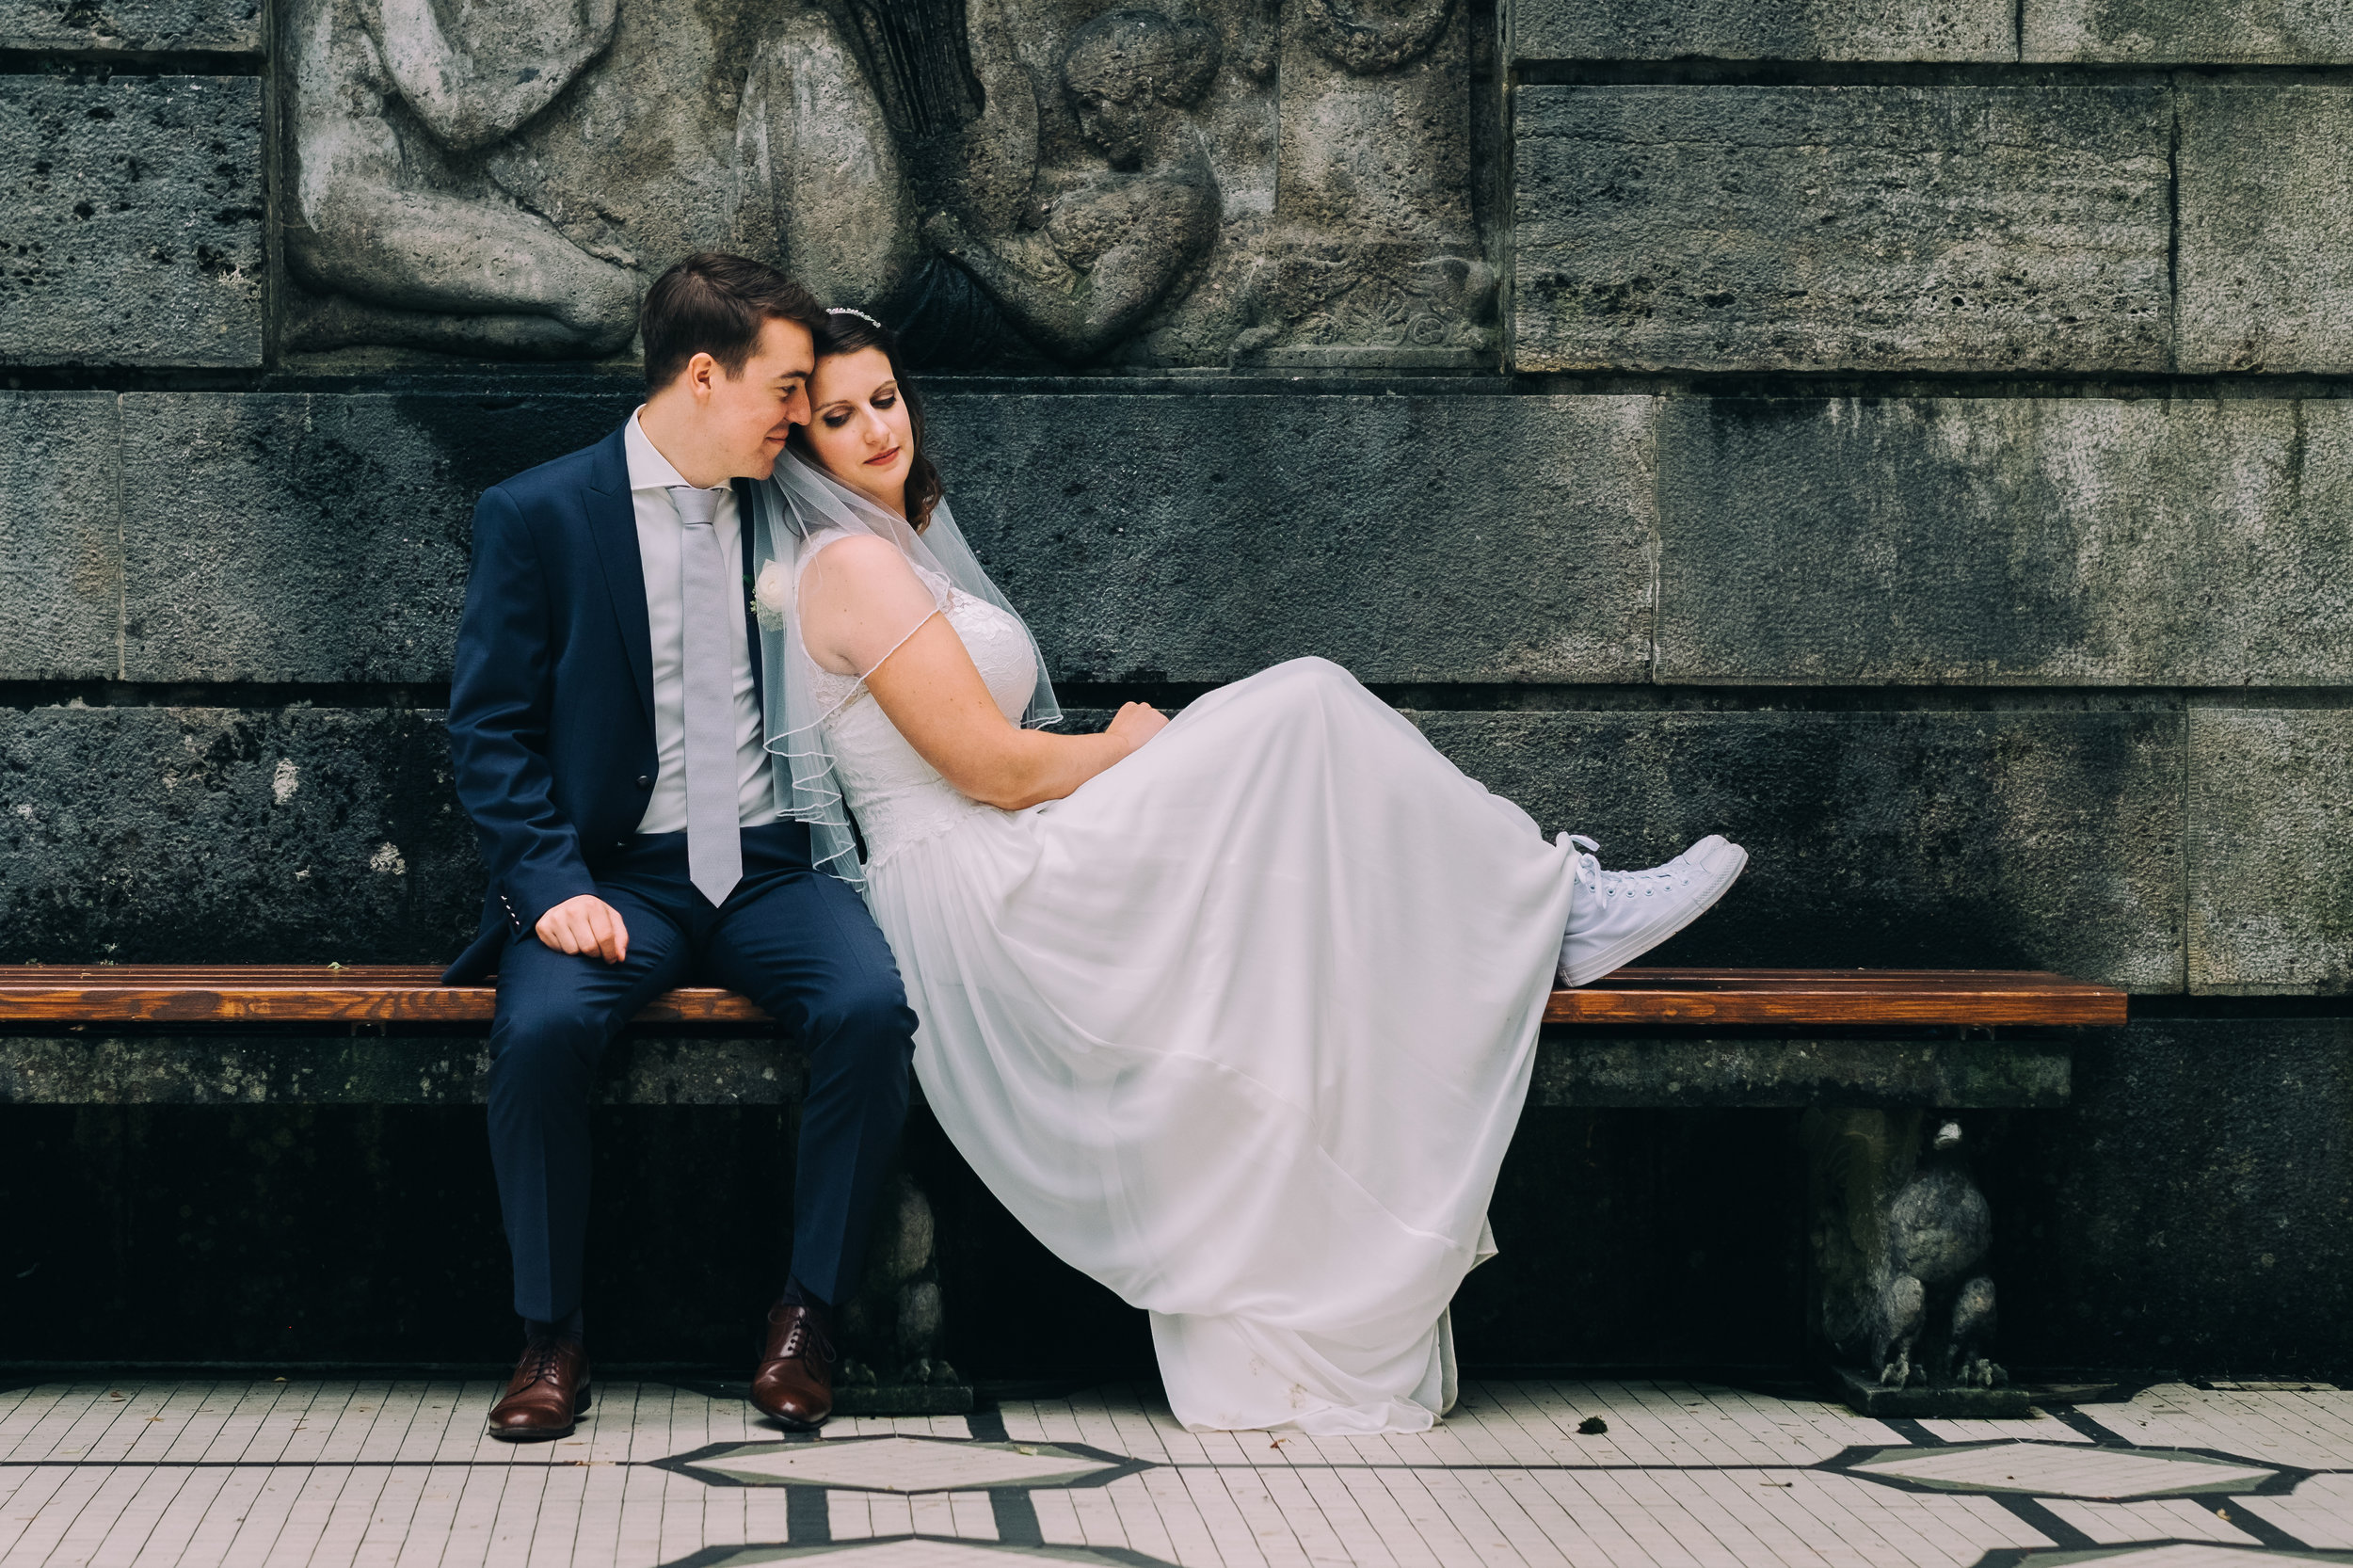 wedding - judit & philipp | Stuttgart, Germany